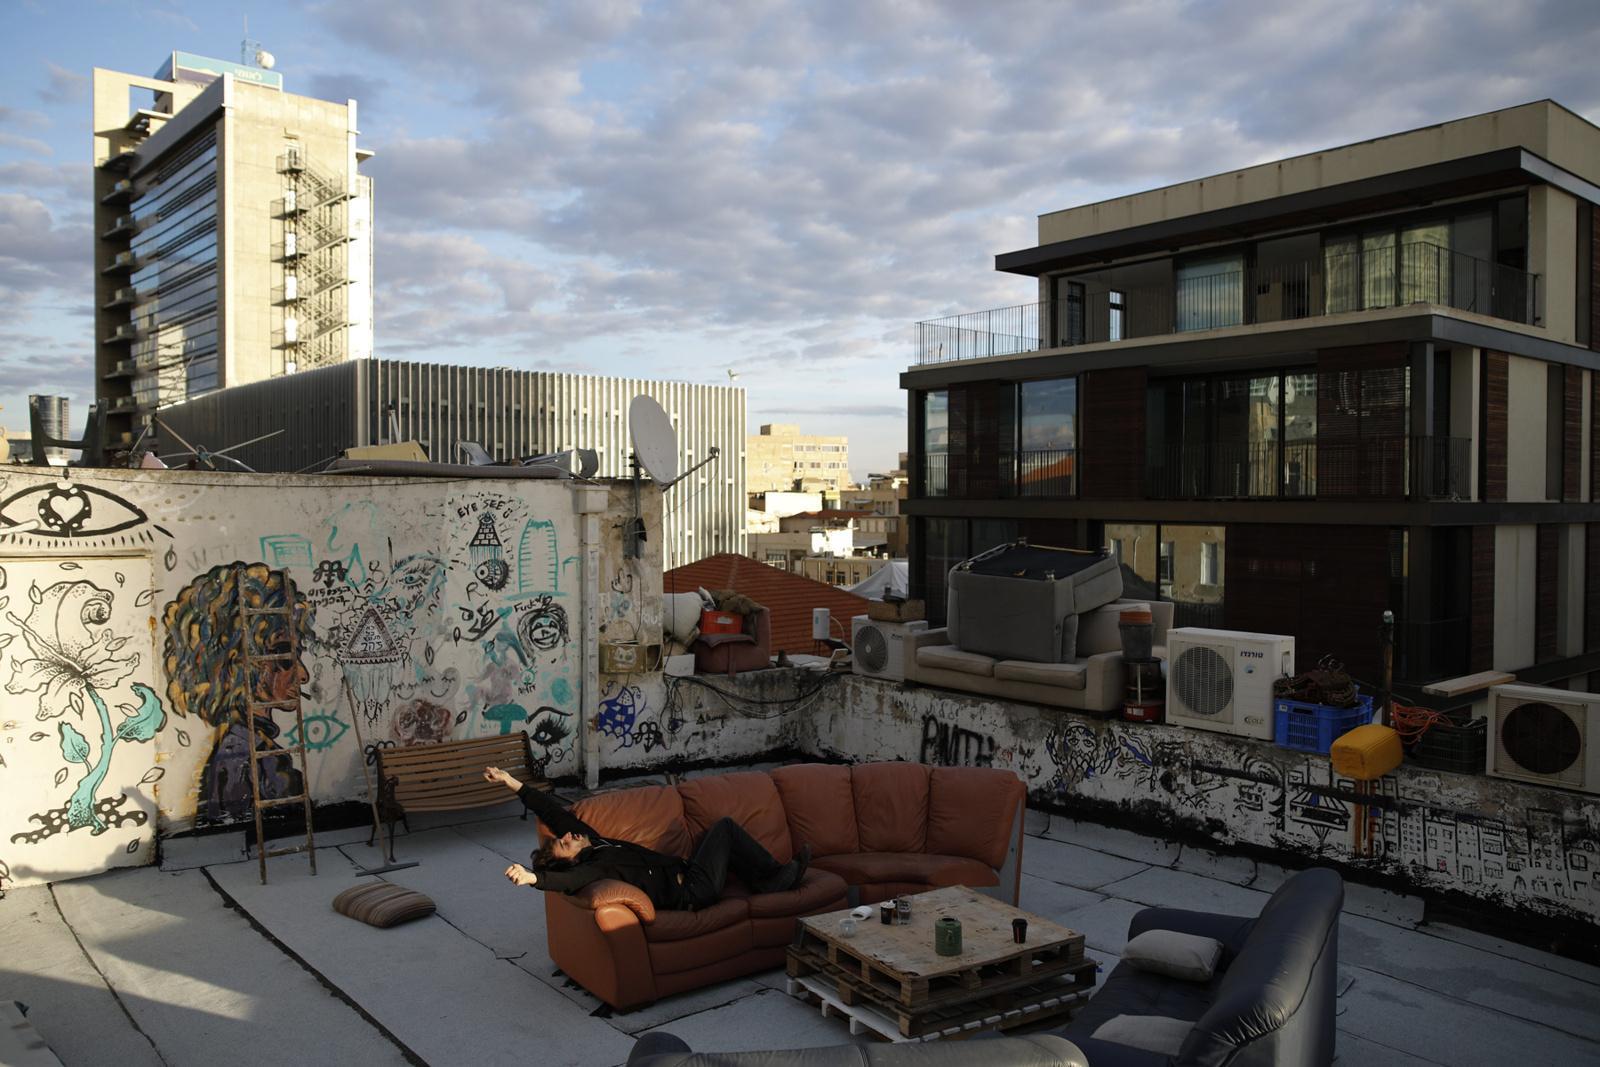 Guy Elhadad, 26, enjoys the afternoon sun on his rooftop, November 24, 2017, Tel Aviv, Israel.